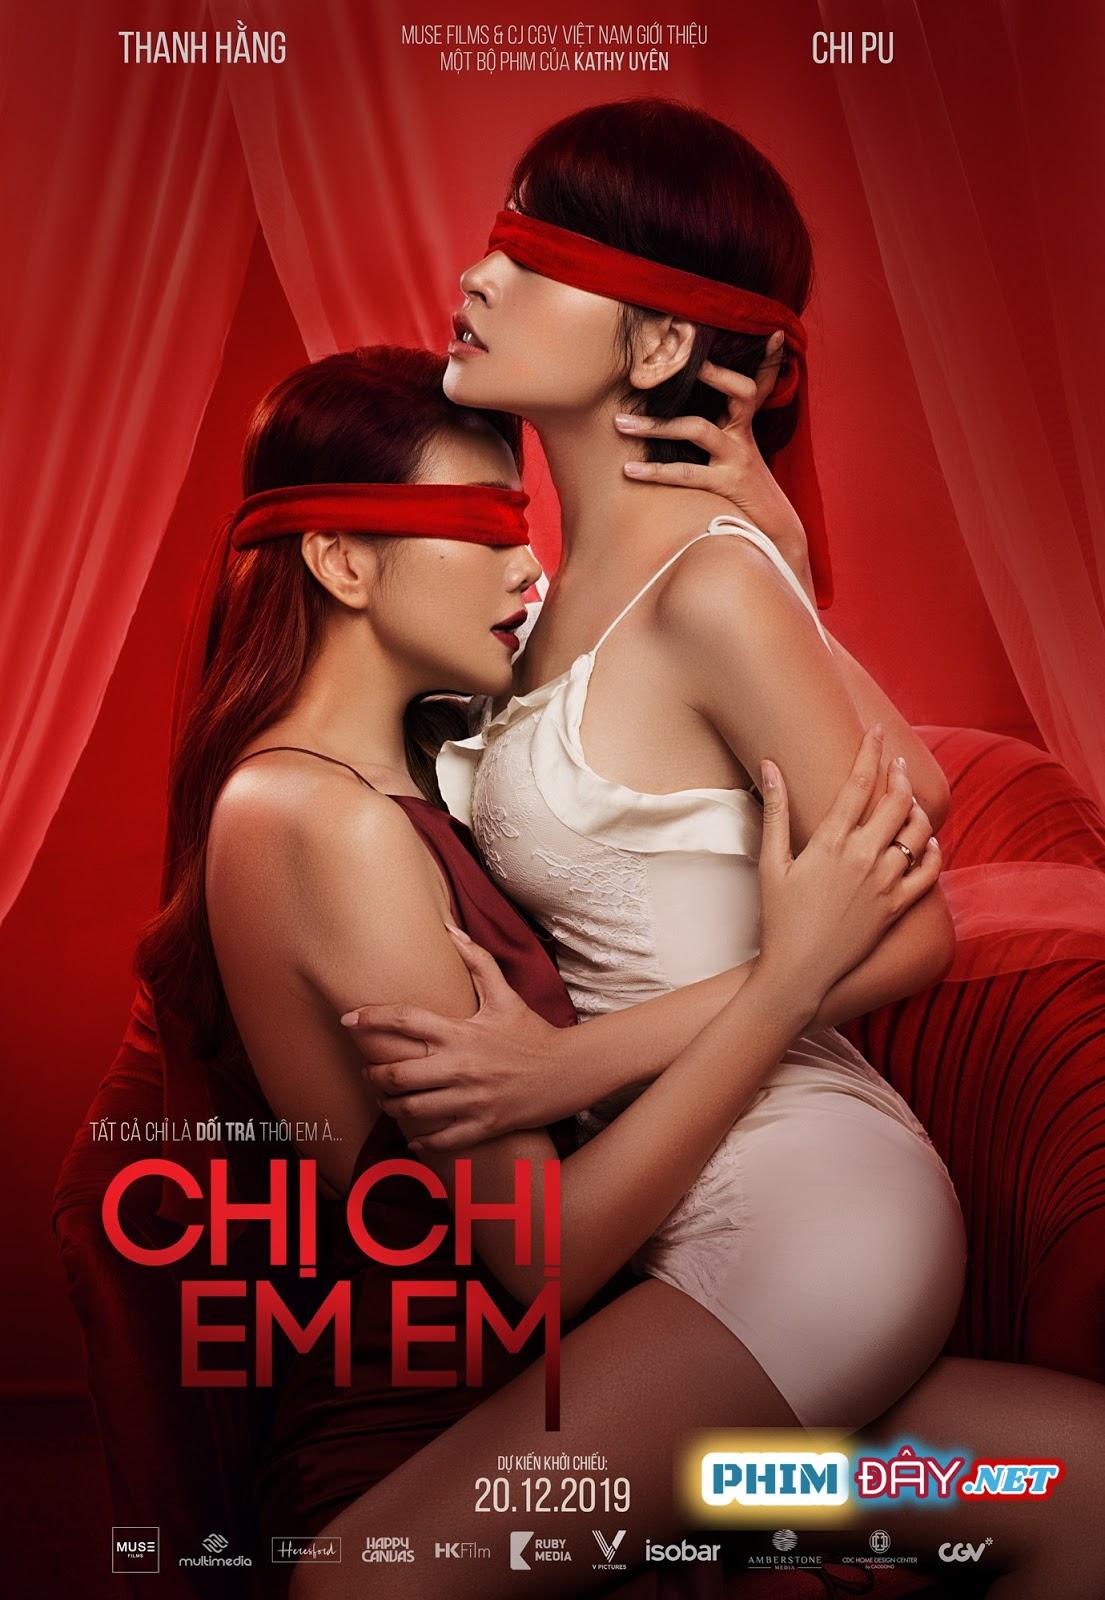 Chị Chị Em Em (2019) - Phim Bom tấn Việt Nam